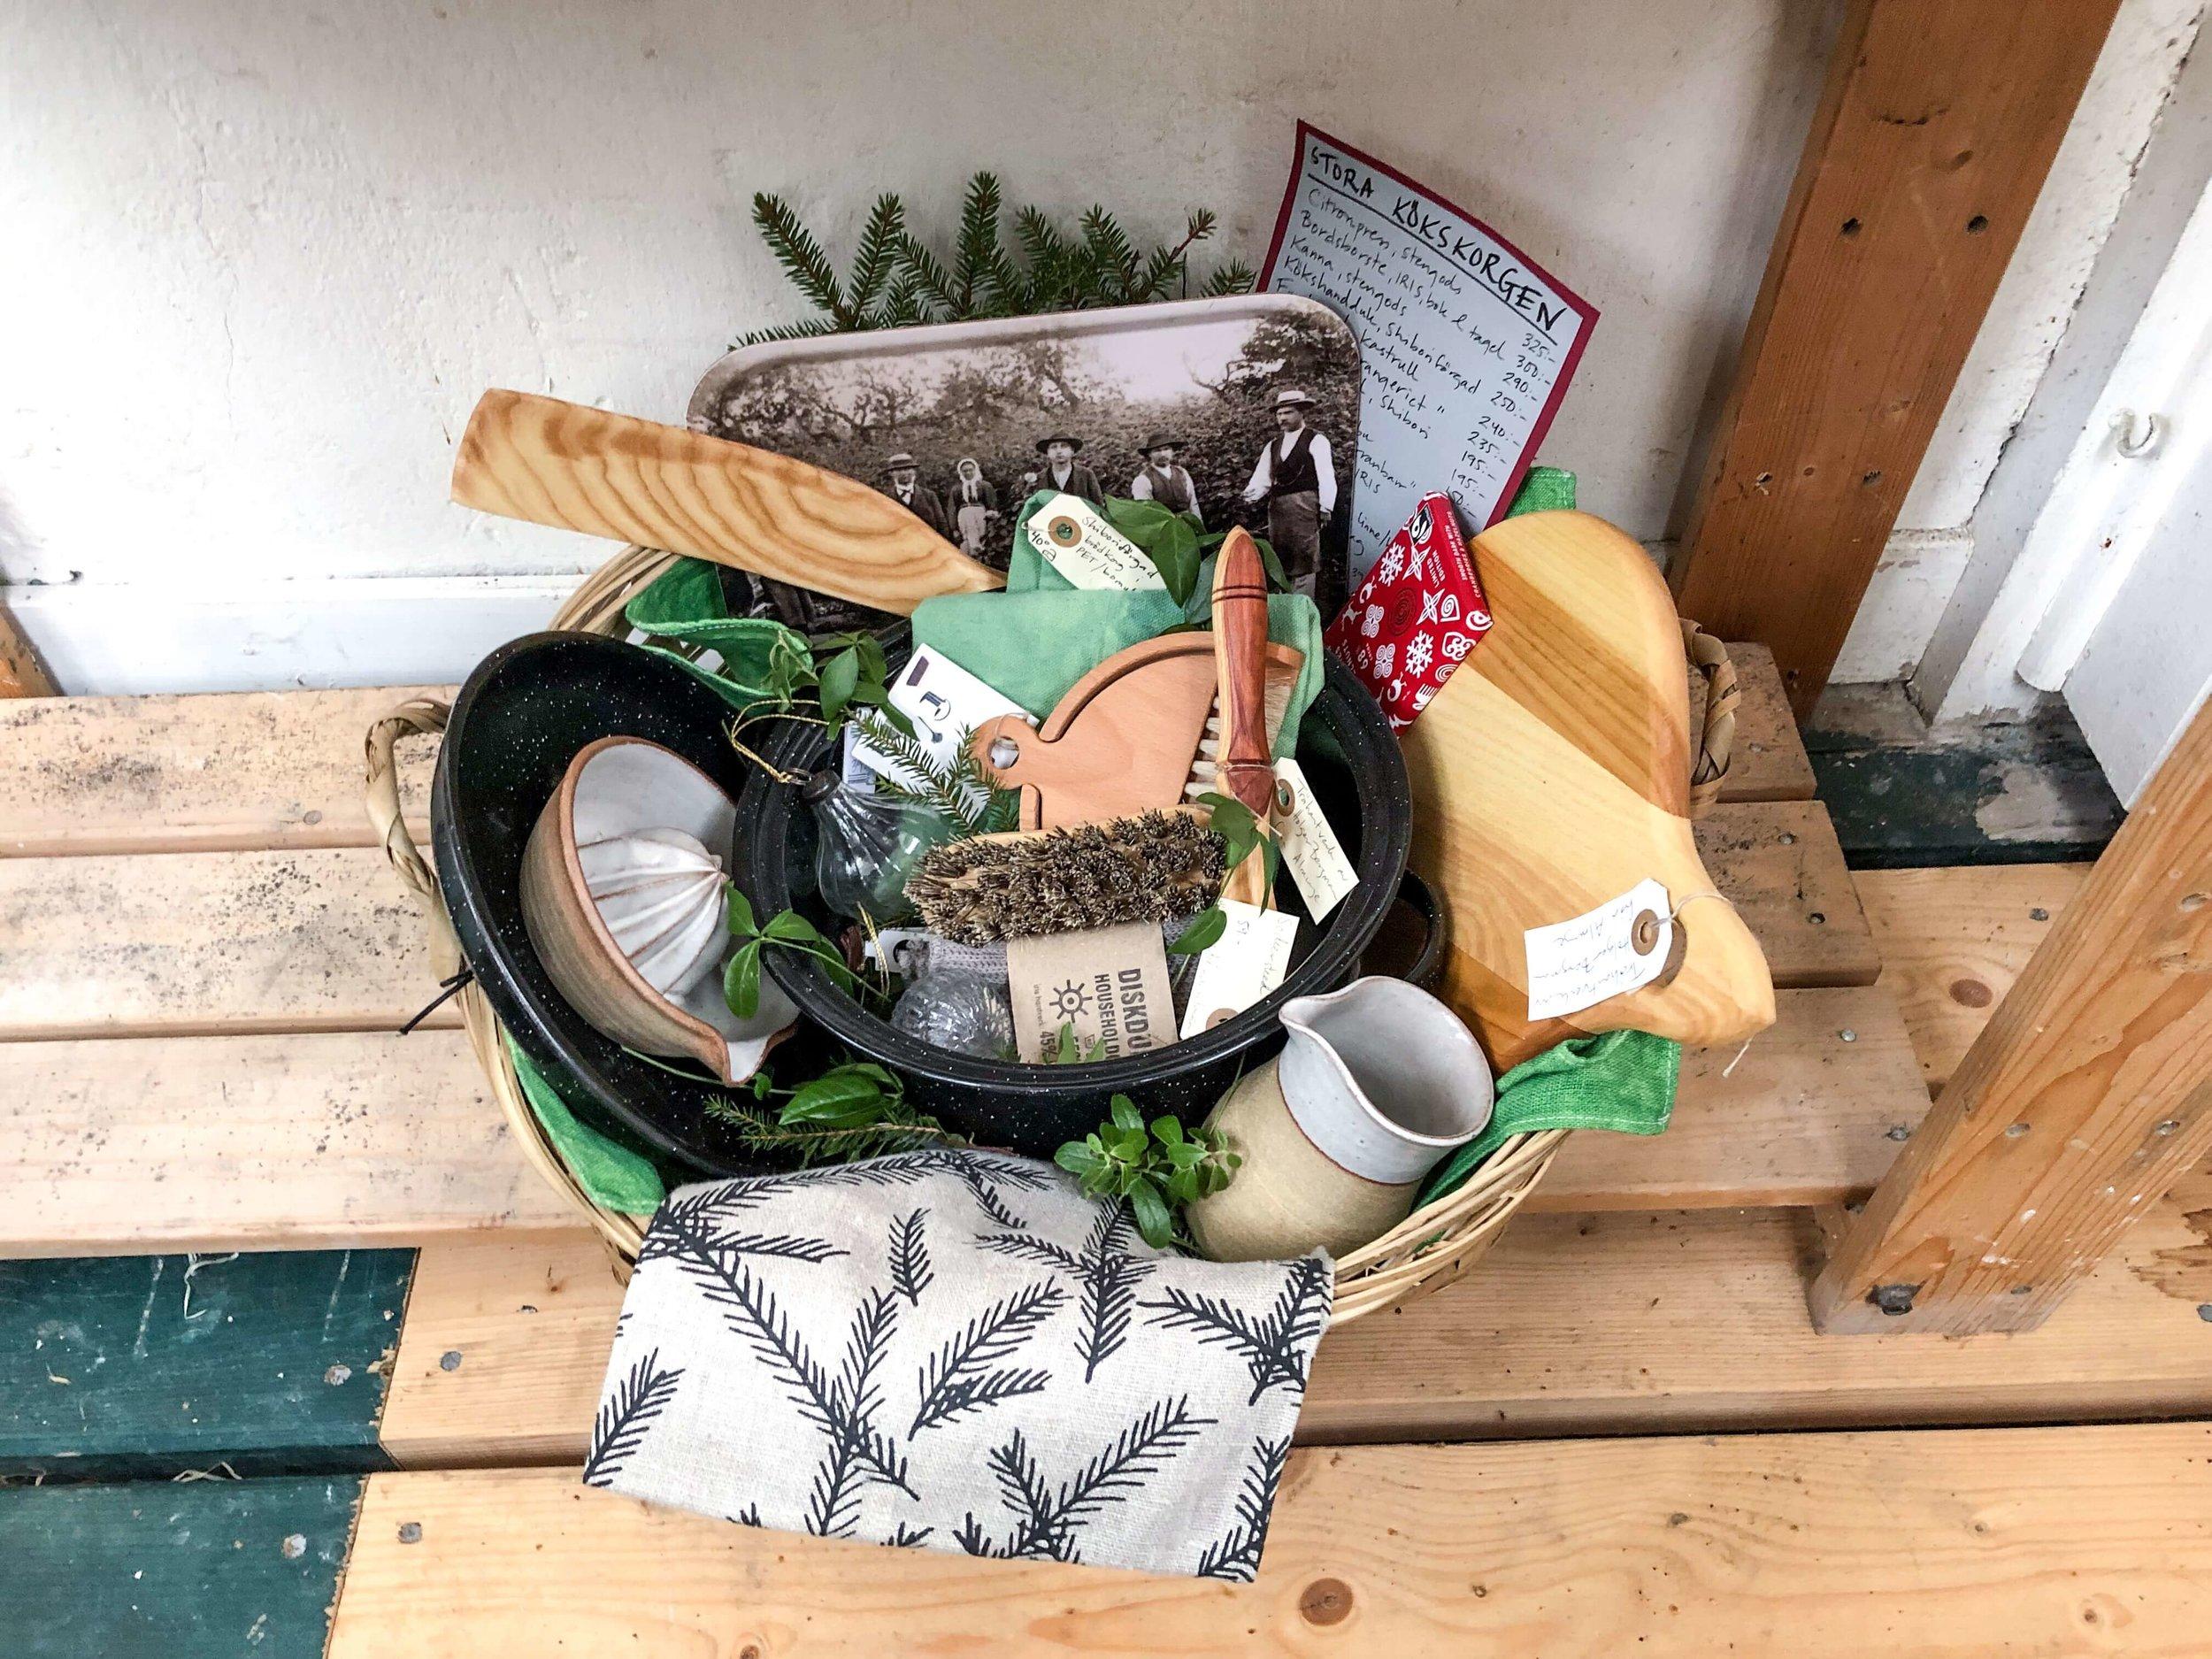 Sadelmakarlängan-Presentkorgar--Jul--2018-2.JPEG